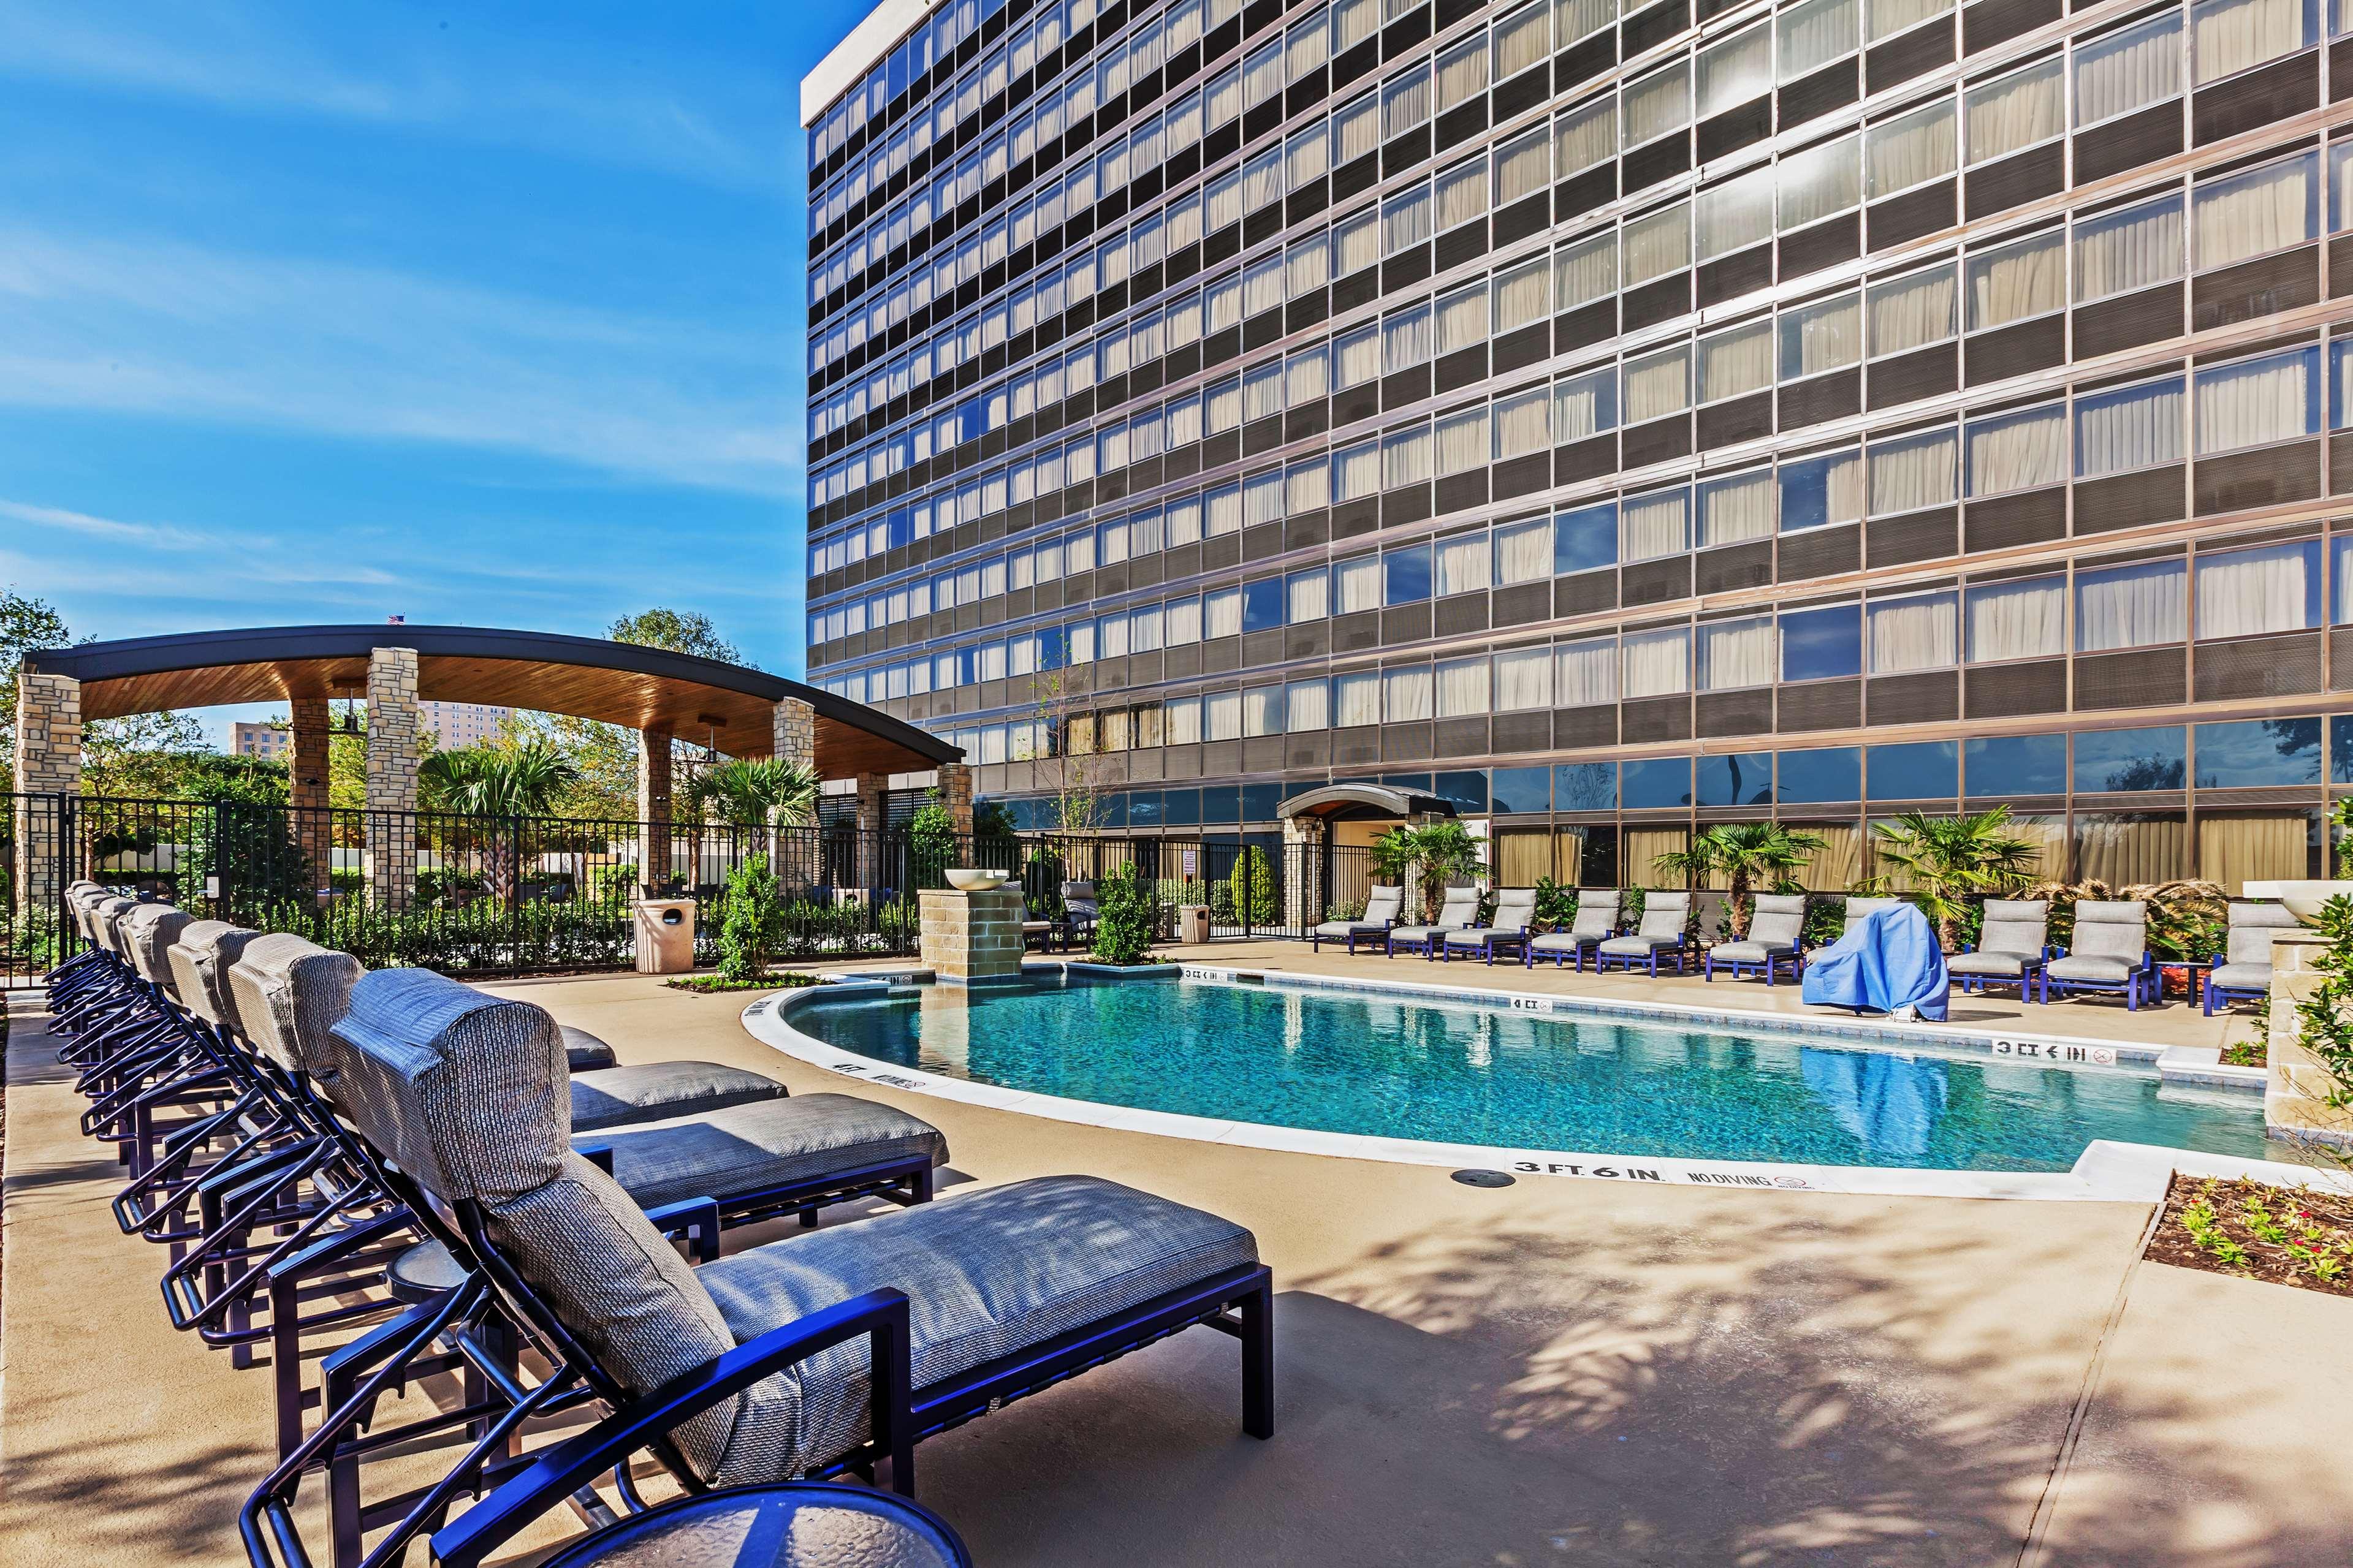 Hilton Waco image 12